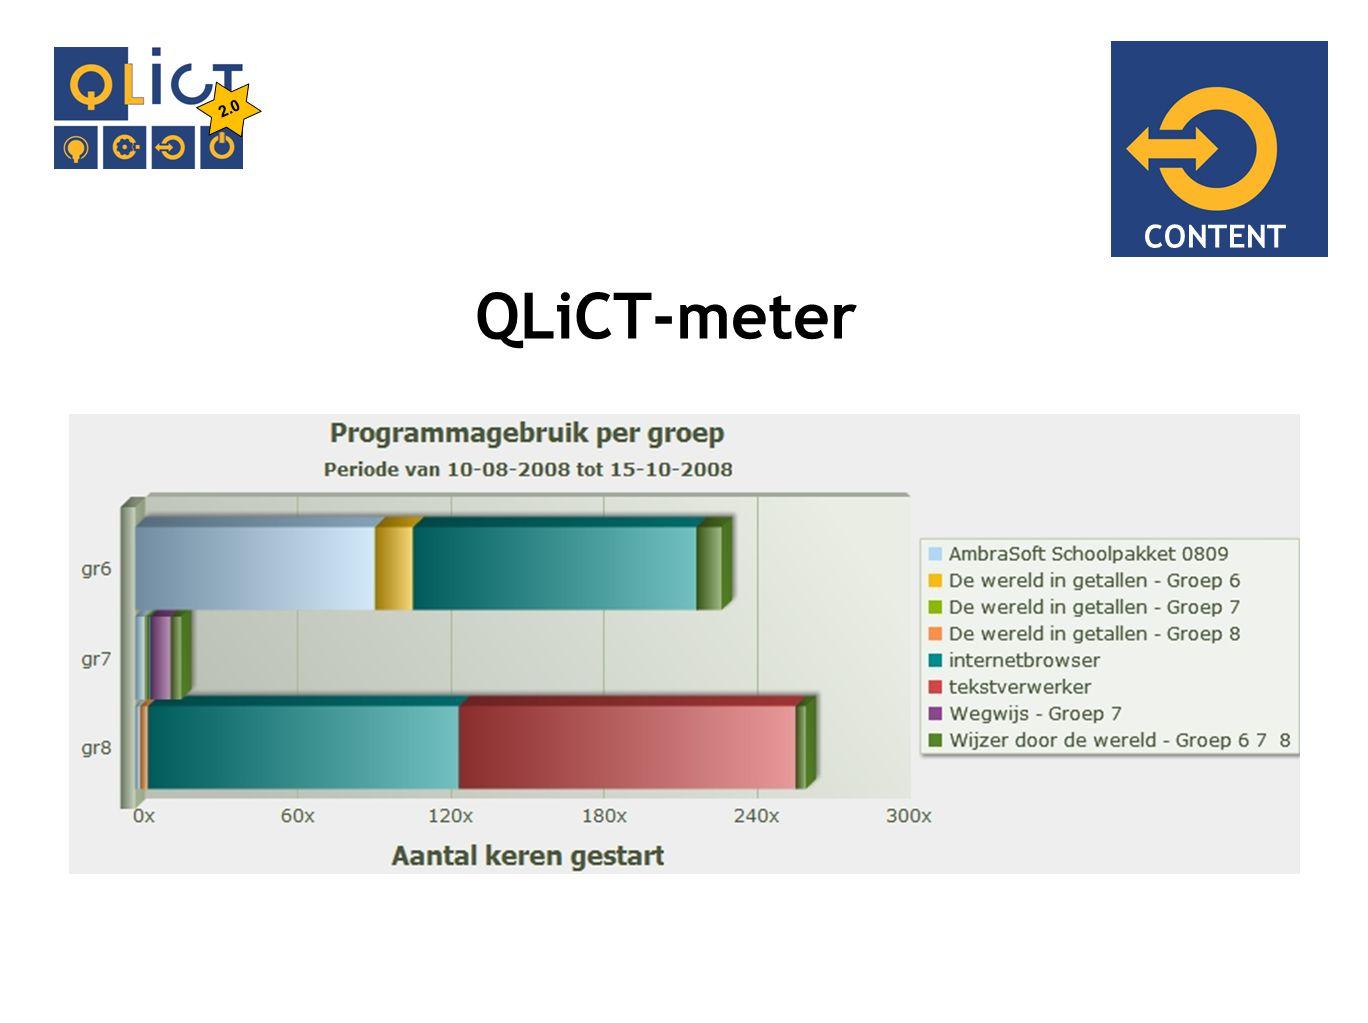 2.0 CONTENT QLiCT-meter